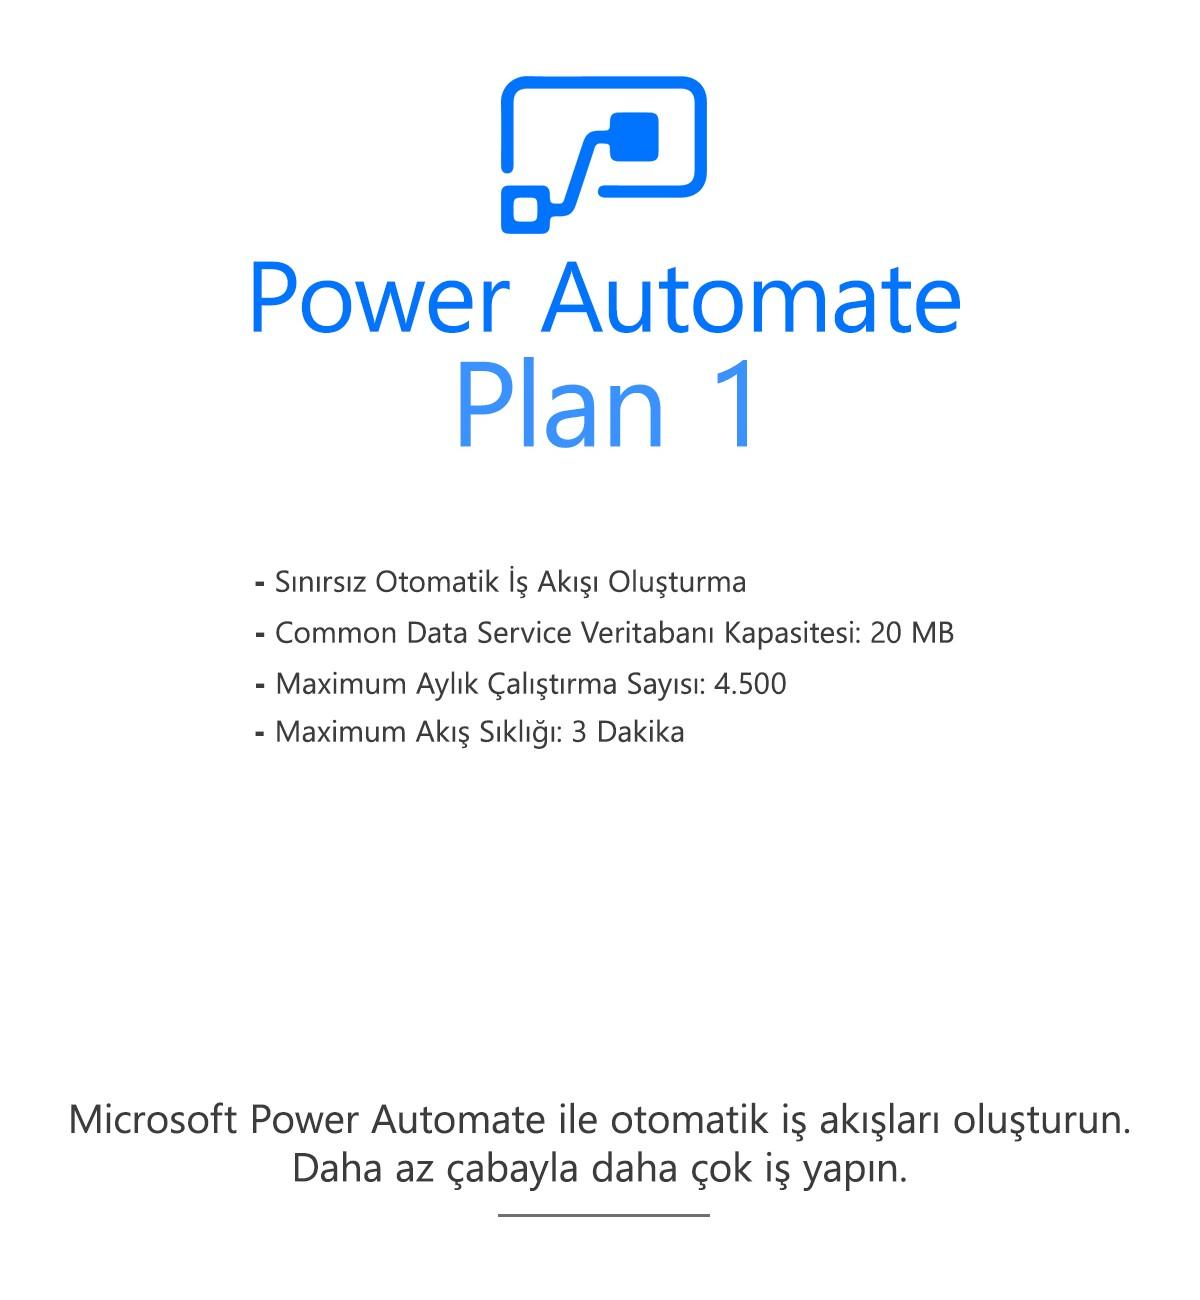 Power Automate Plan 1